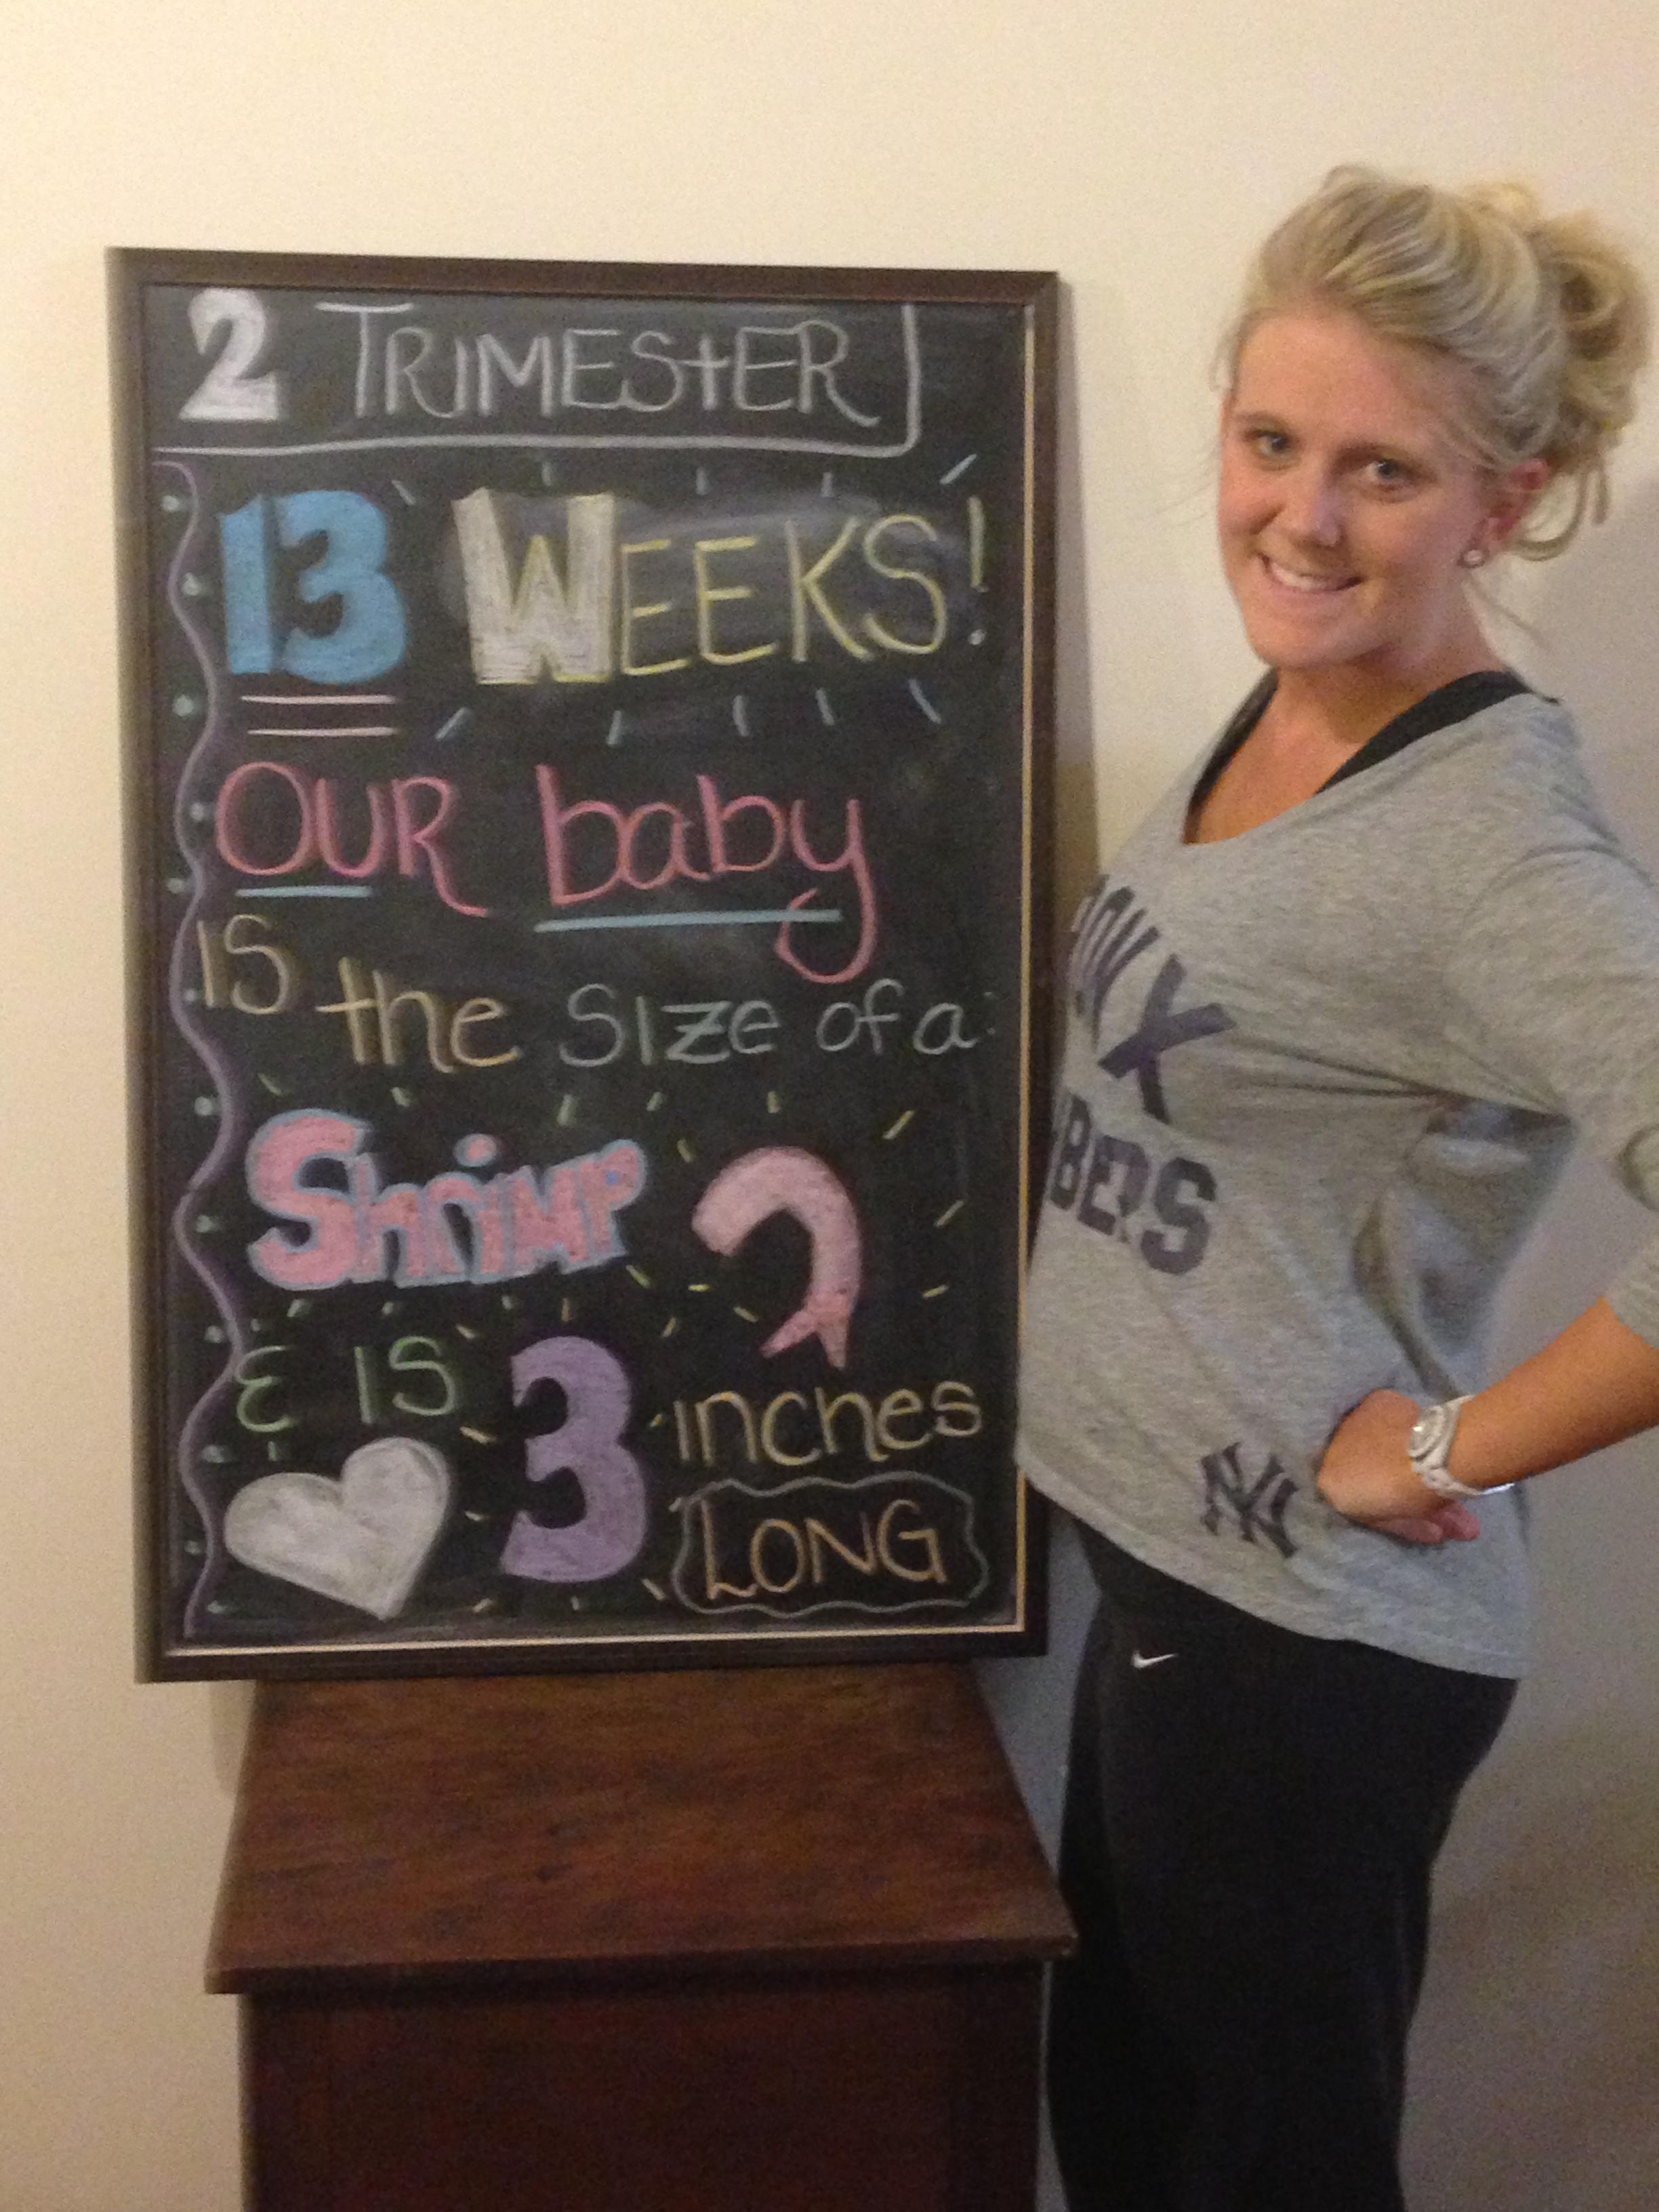 13 WEEKS!!! Hello 2nd Trimester! | Sweet Life